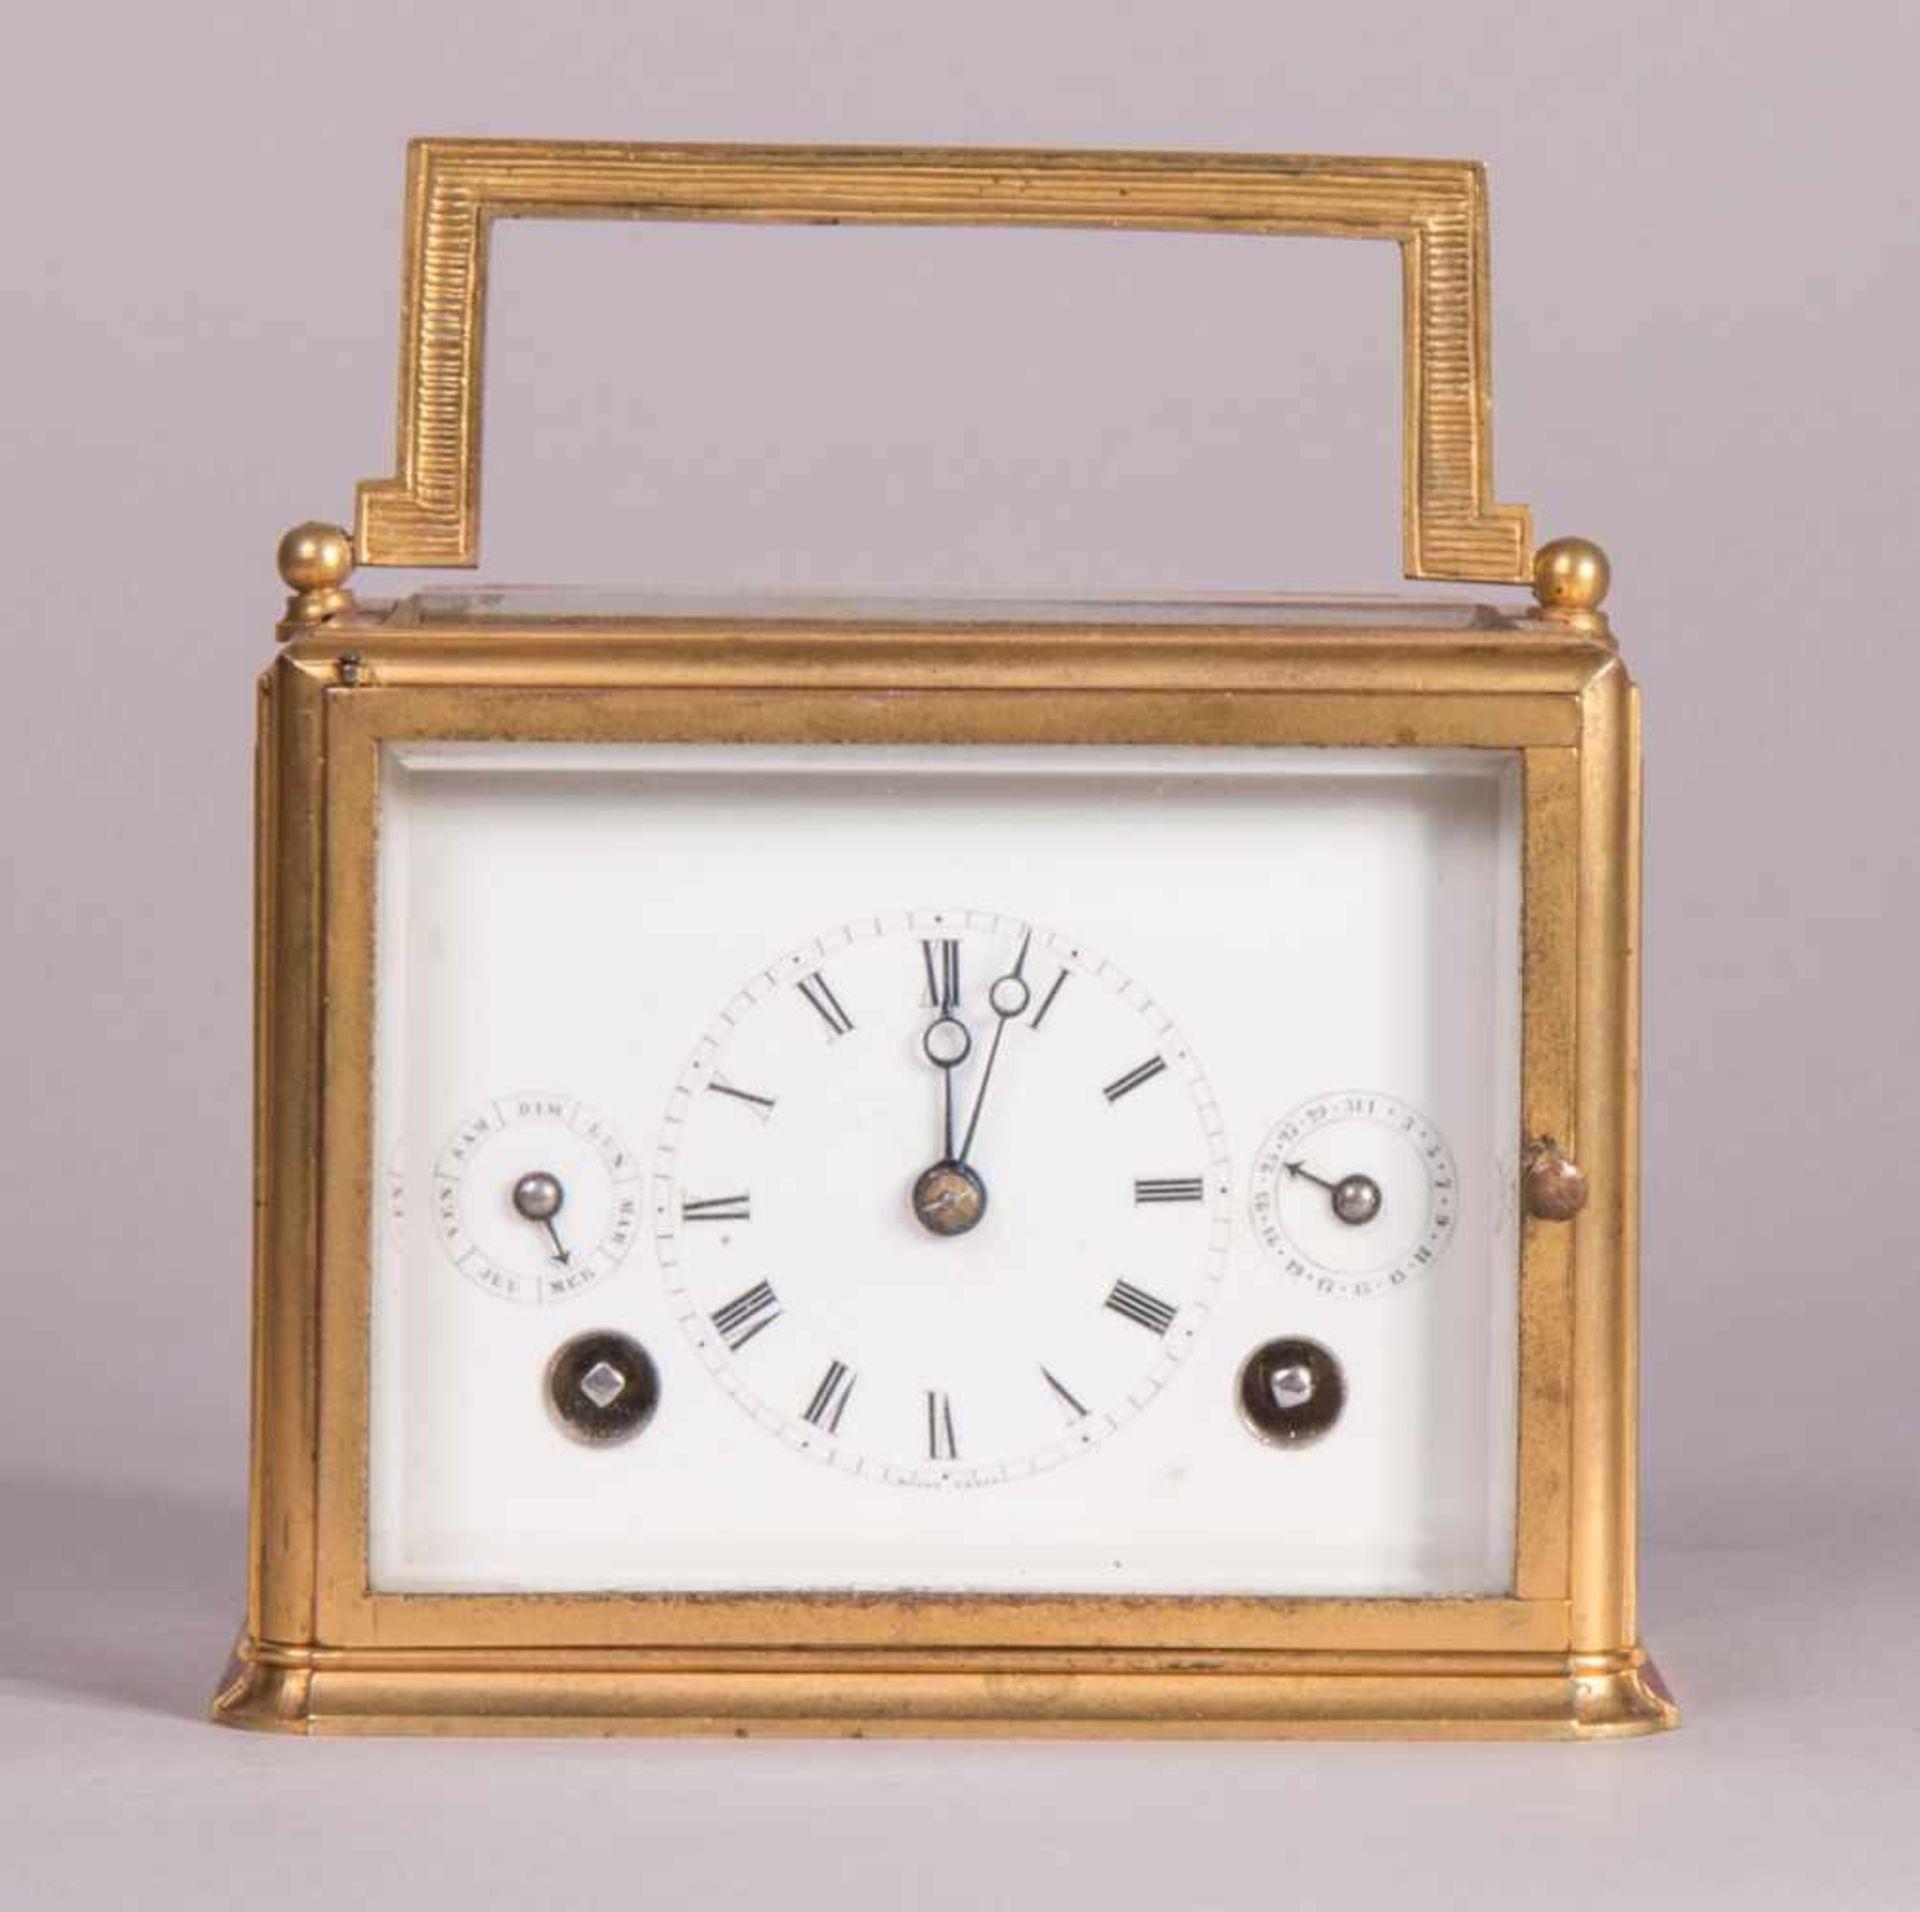 Los 61 - extremely rare travel clock 1805 Schaffhausen by Heinrich MoserTravel clock with original case